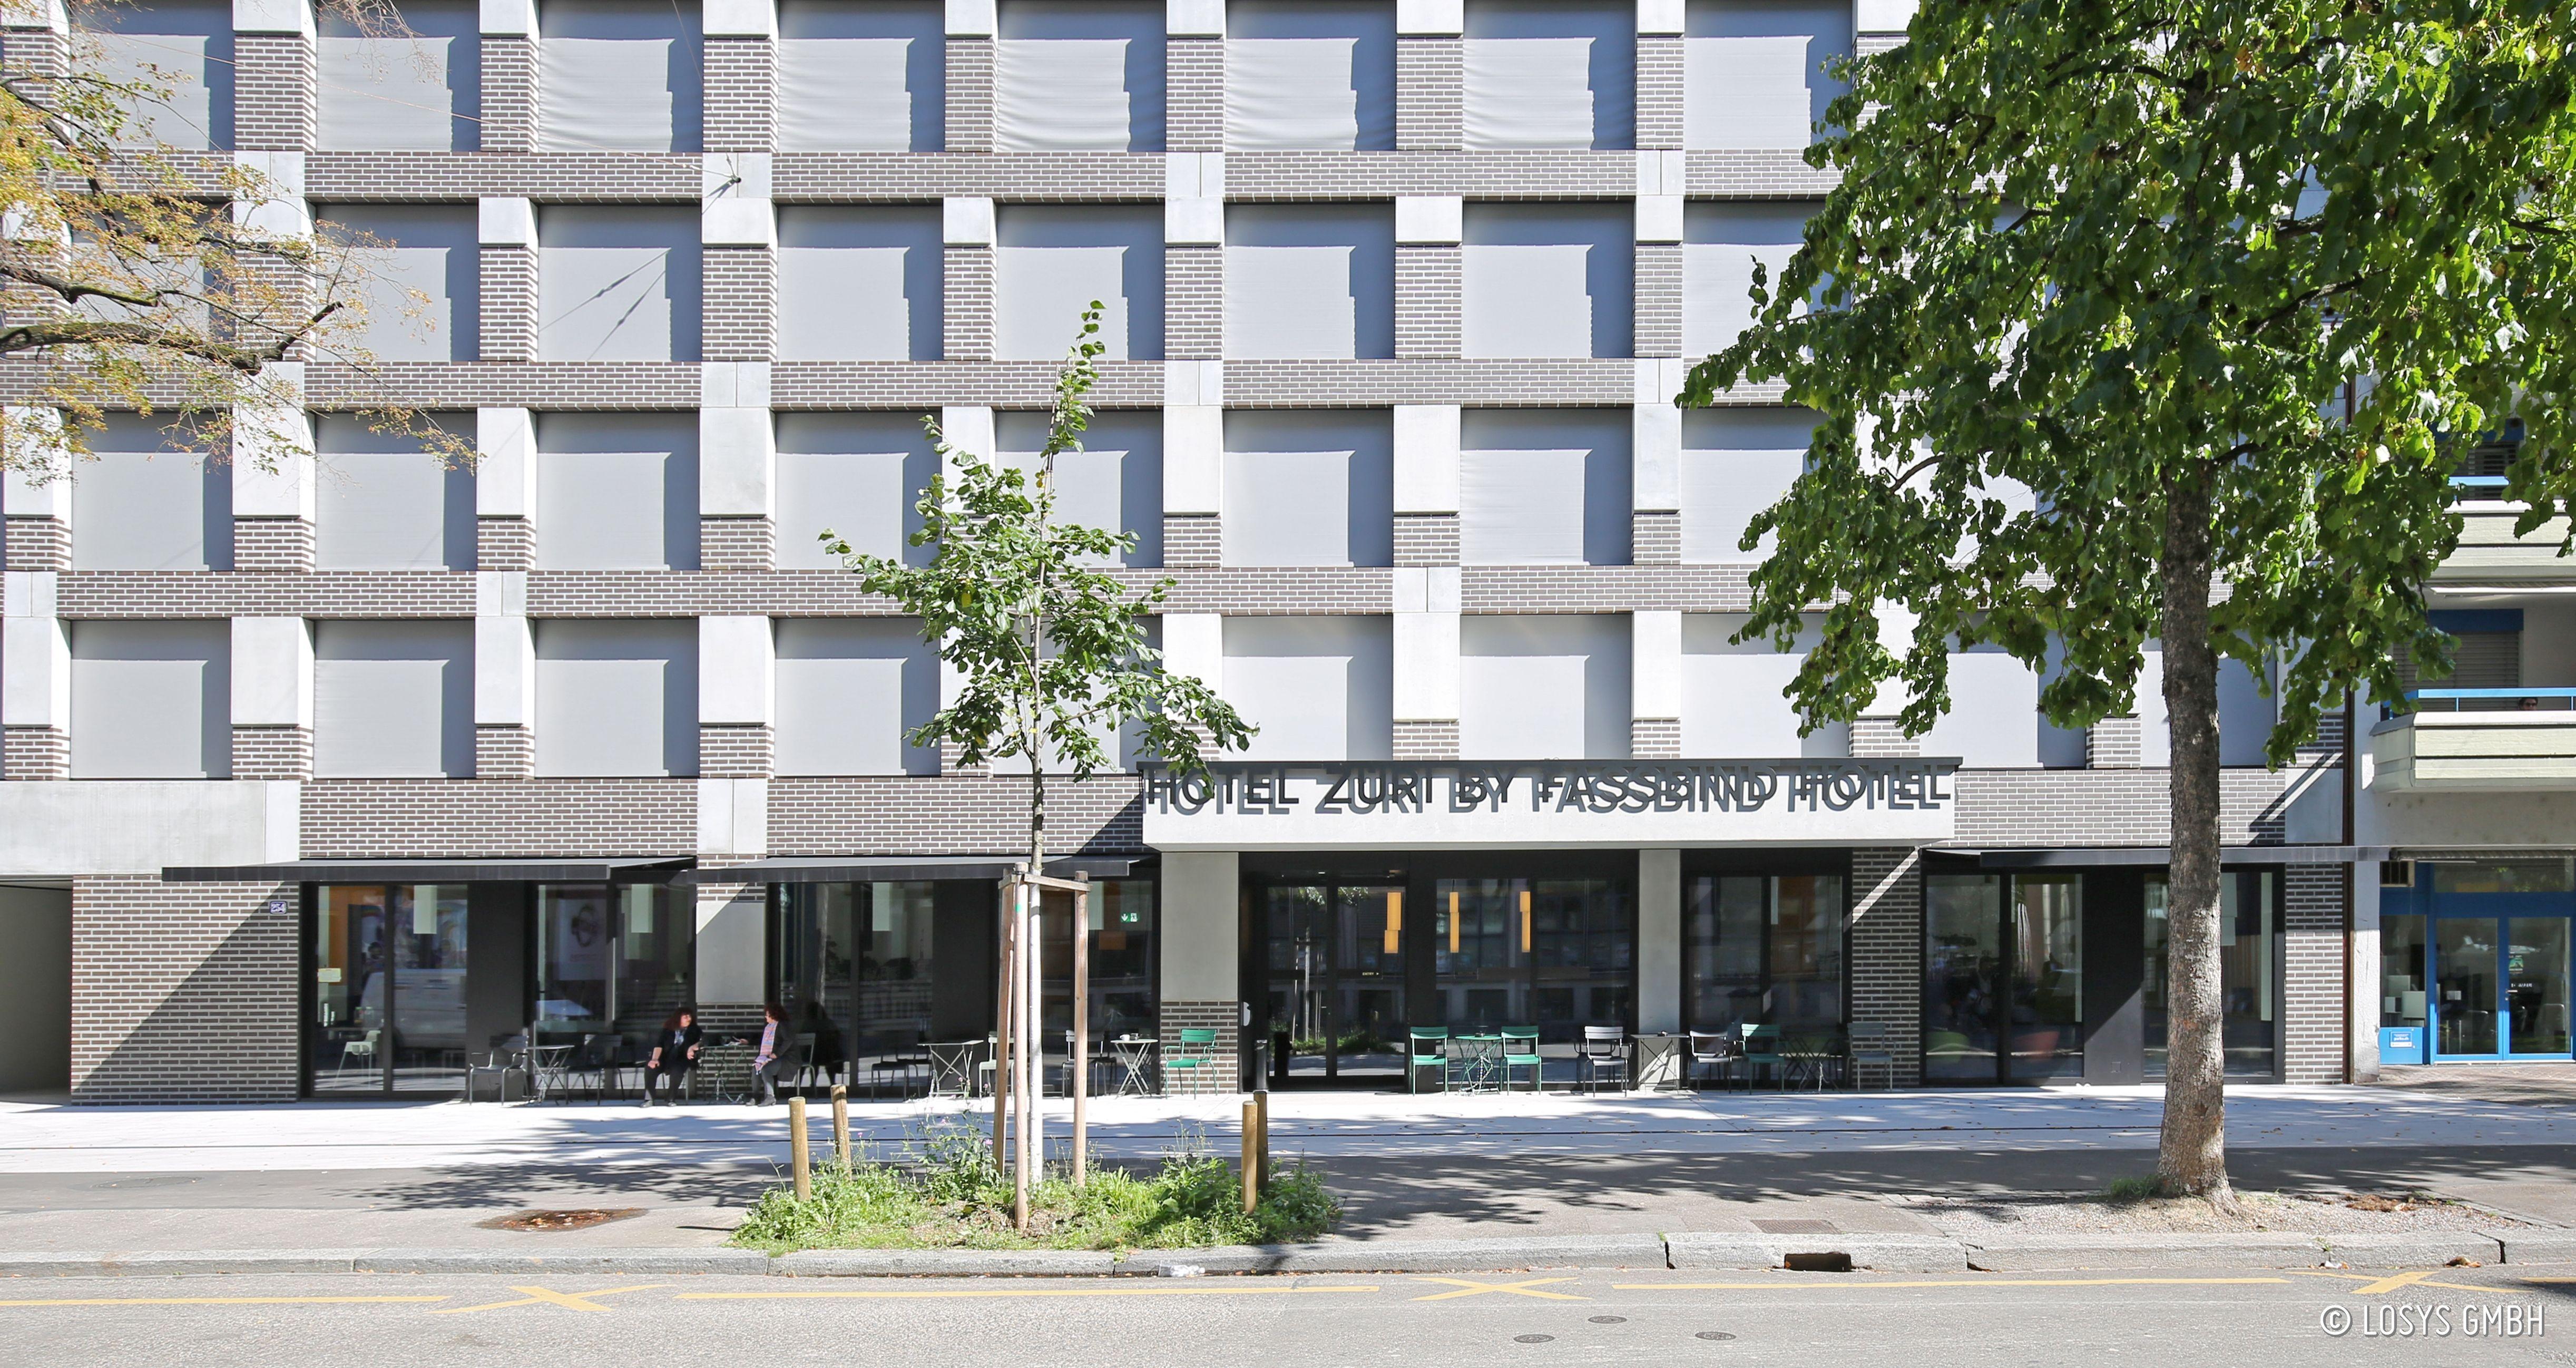 Hotel Züri by Fassbind